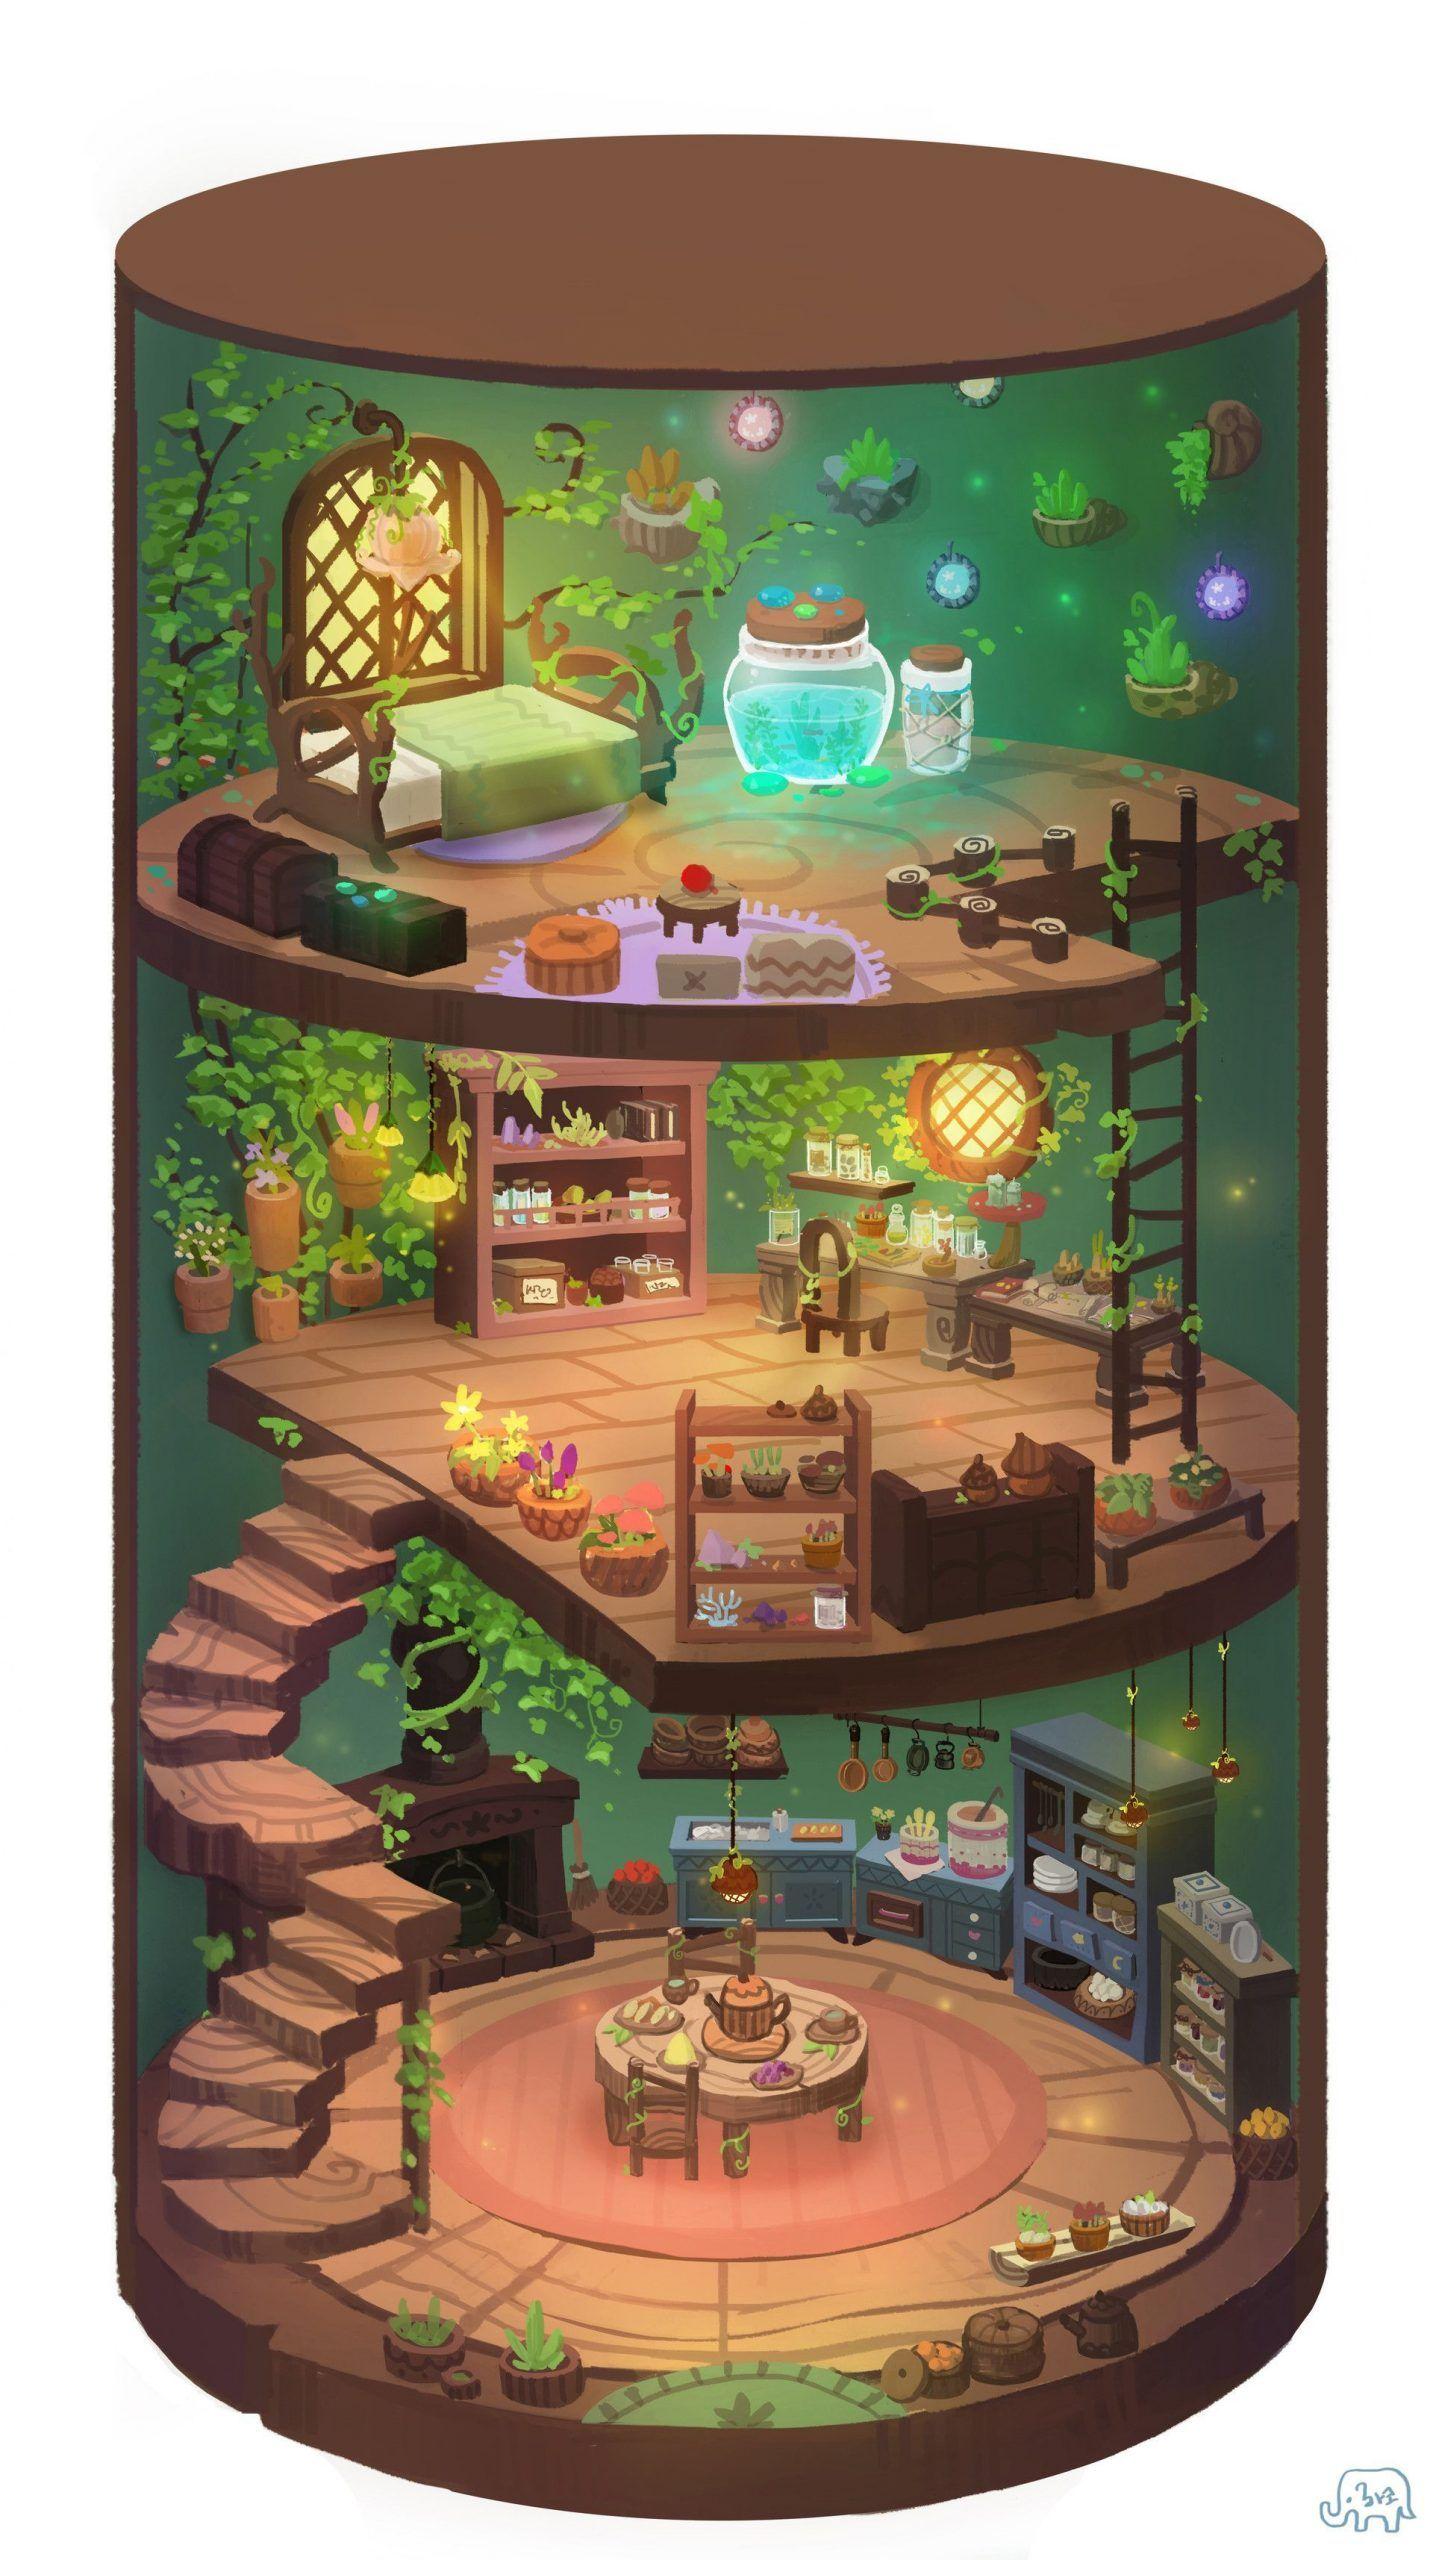 Pin By Jonas On Haus Grundriss In 2020 Environment Concept Art Cartoon House Home Art